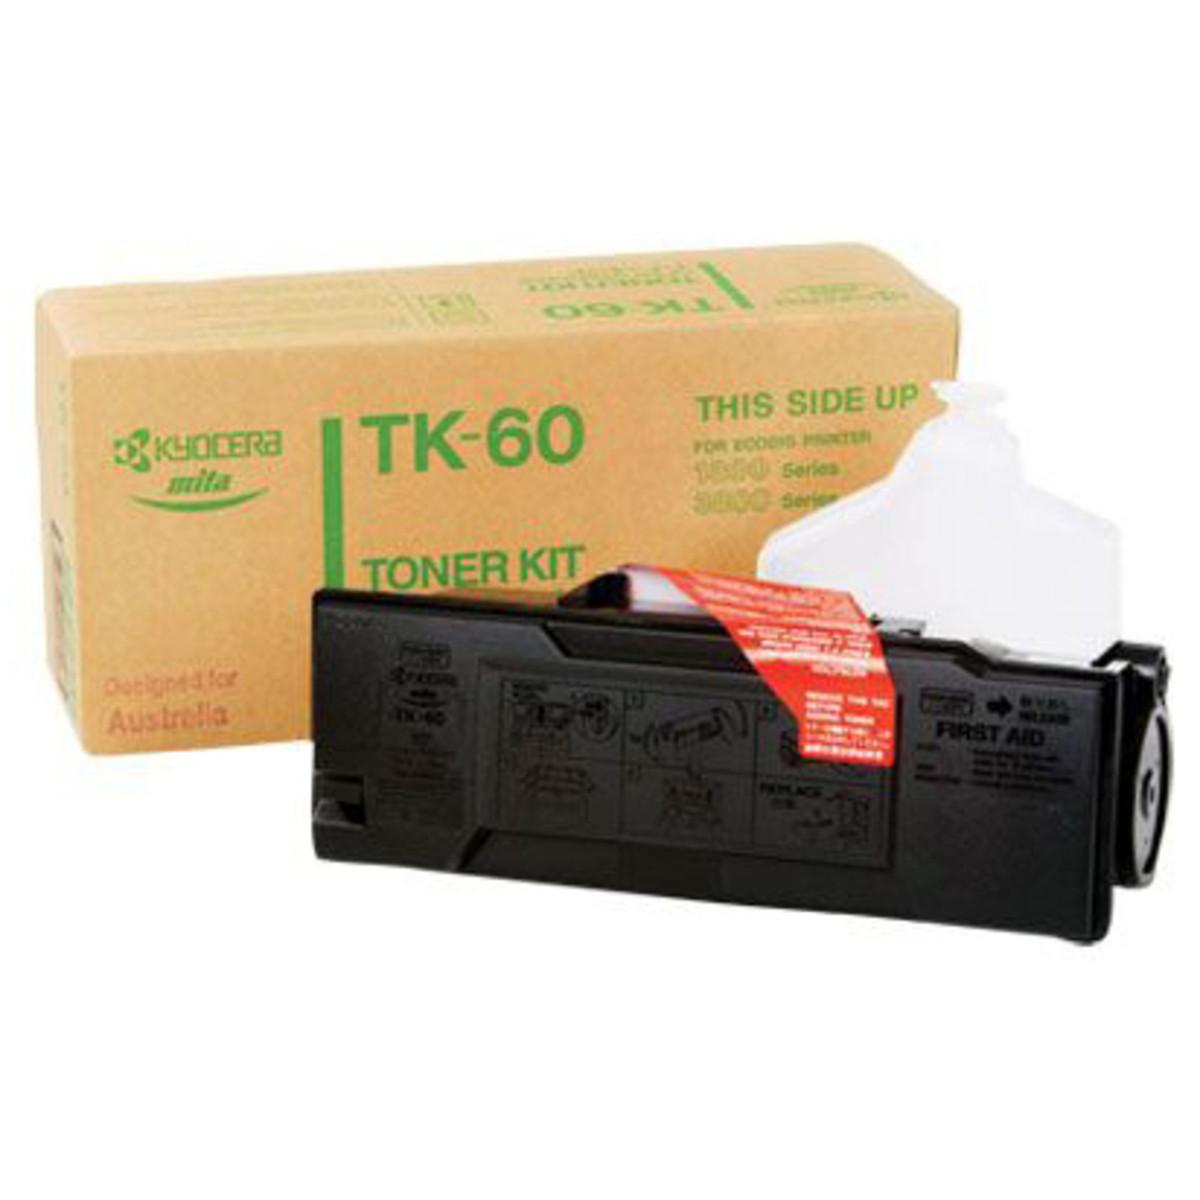 Kyocera TK-60 Black Toner Cartridge